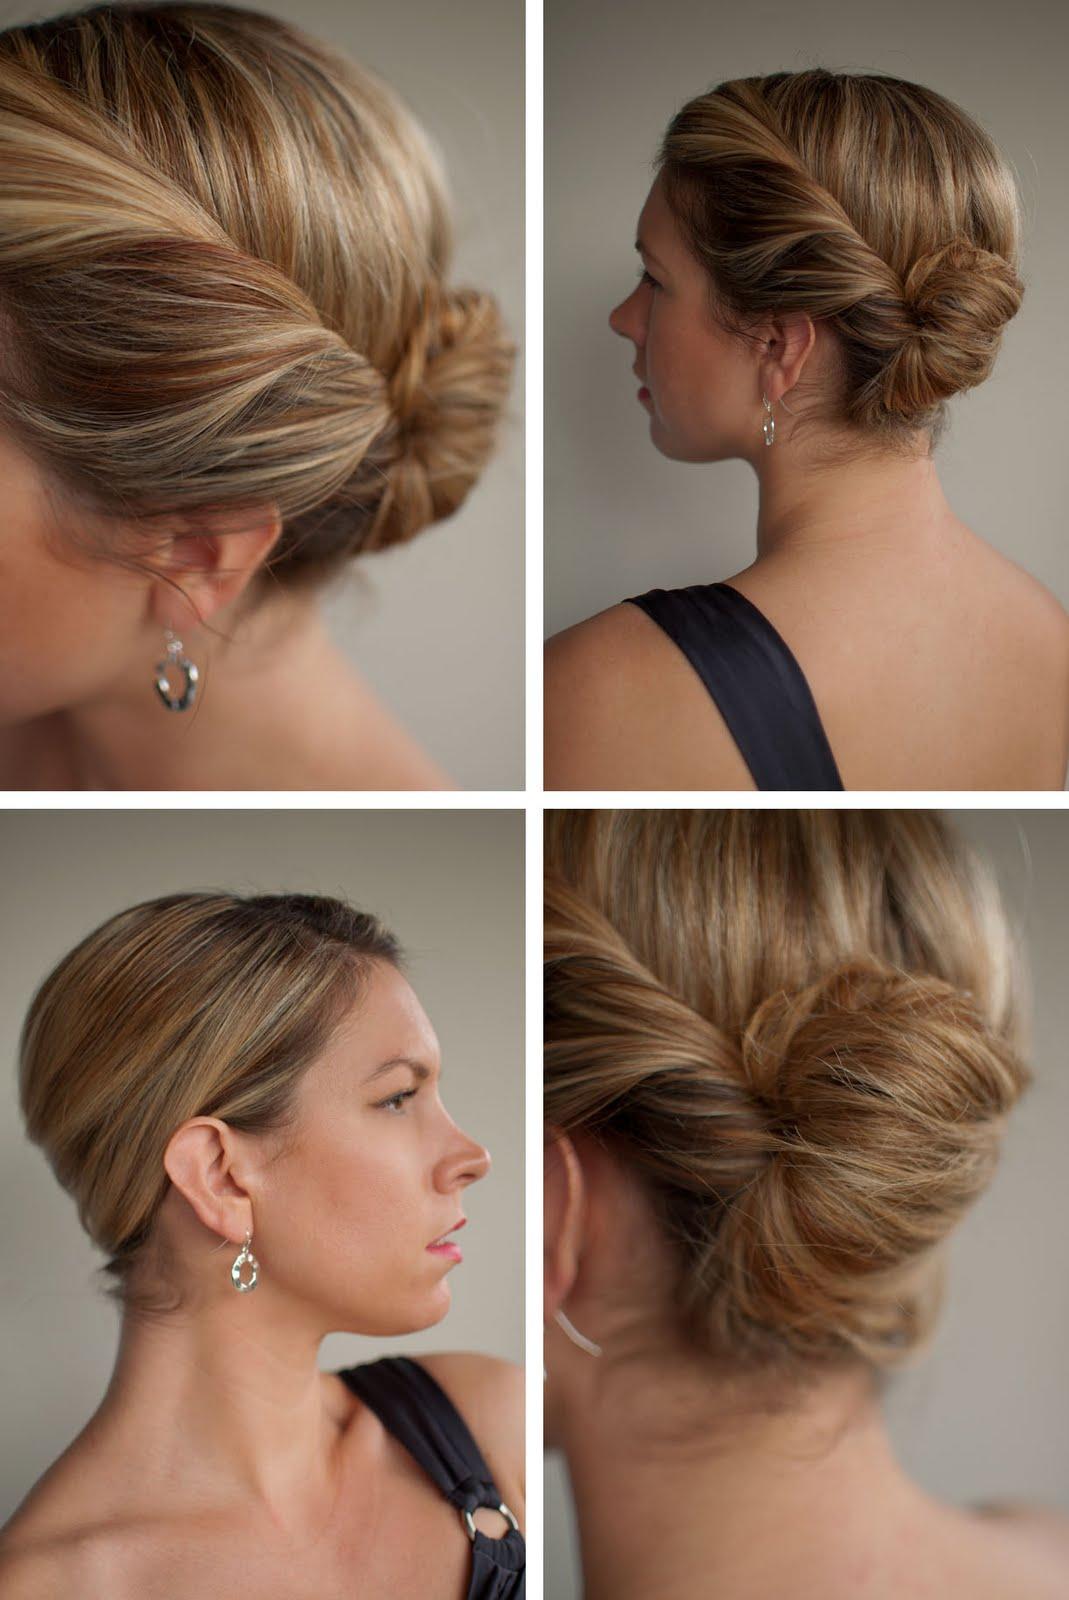 Prime 30 Days Of Twist Amp Pin Hairstyles Day 28 Hair Romance Short Hairstyles For Black Women Fulllsitofus